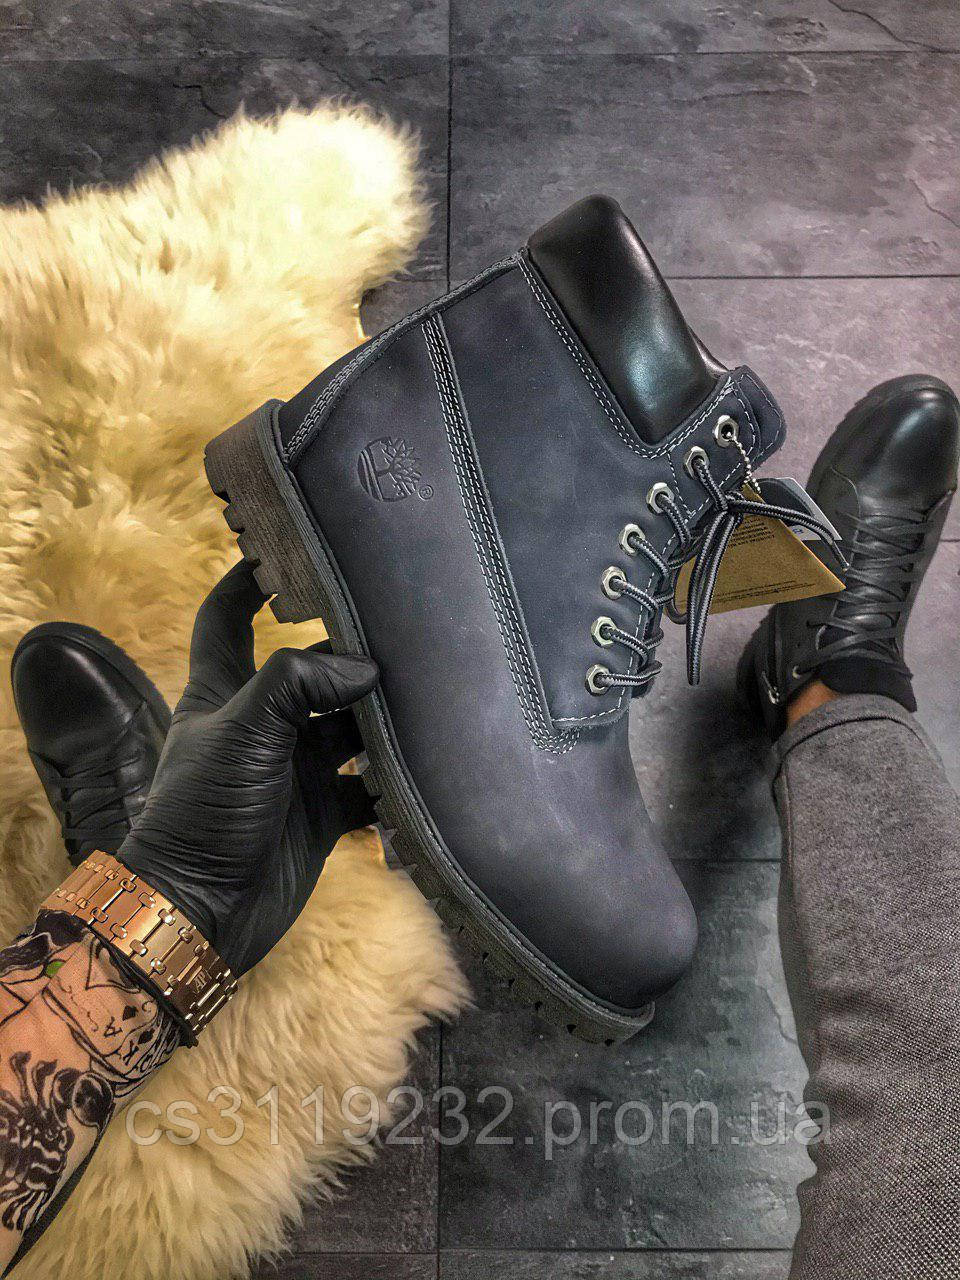 Мужские демисезонные ботинки Timberland Grey (серый)